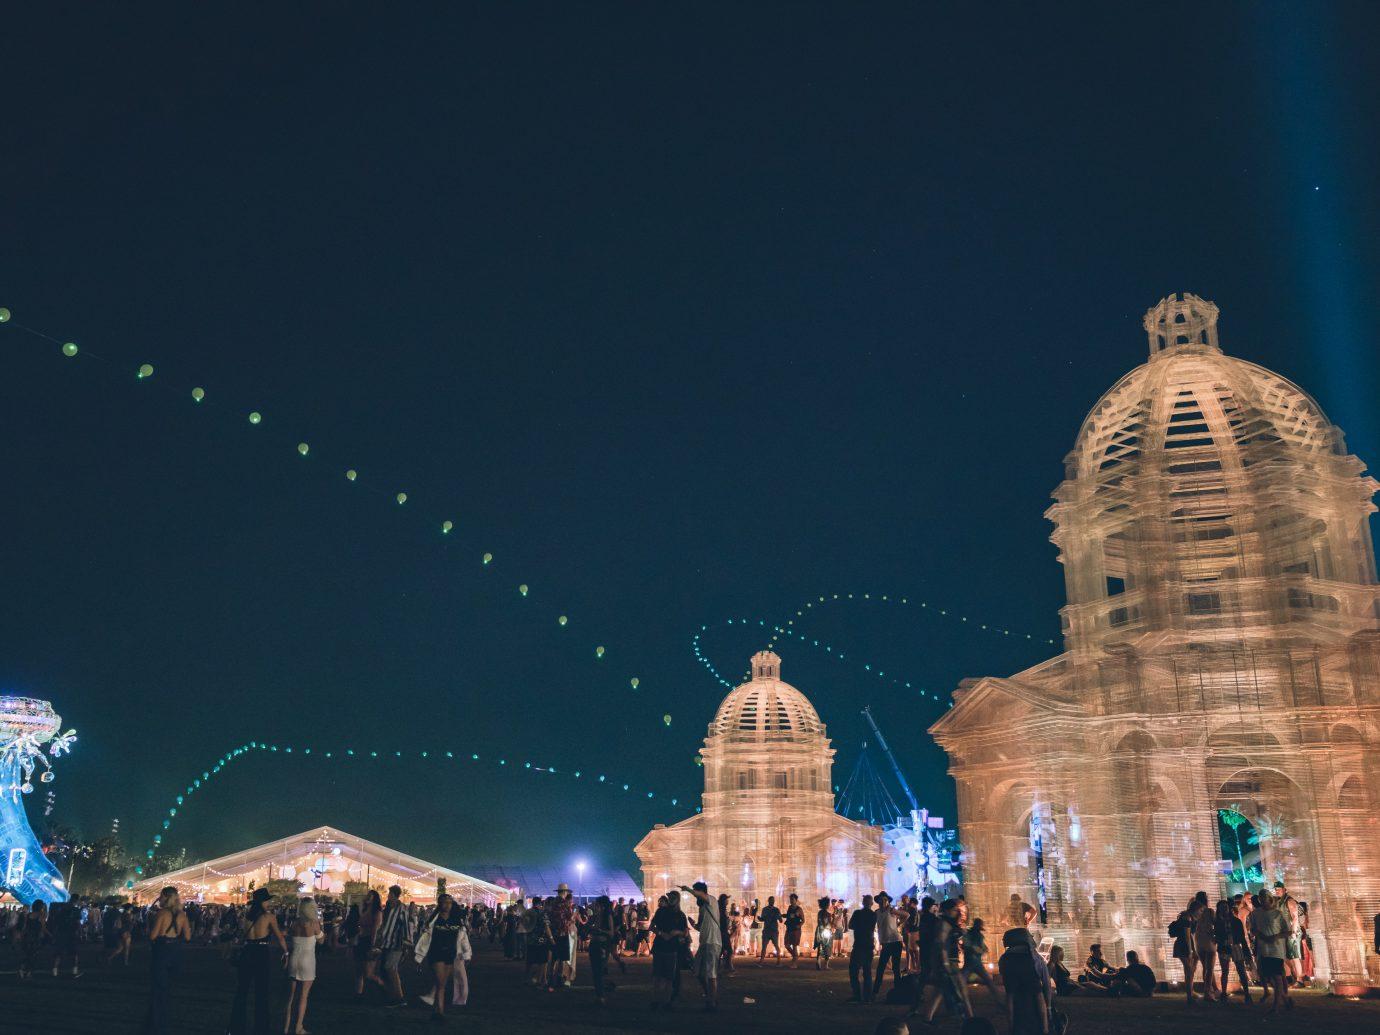 Coachella Music Festival, 2018 at night